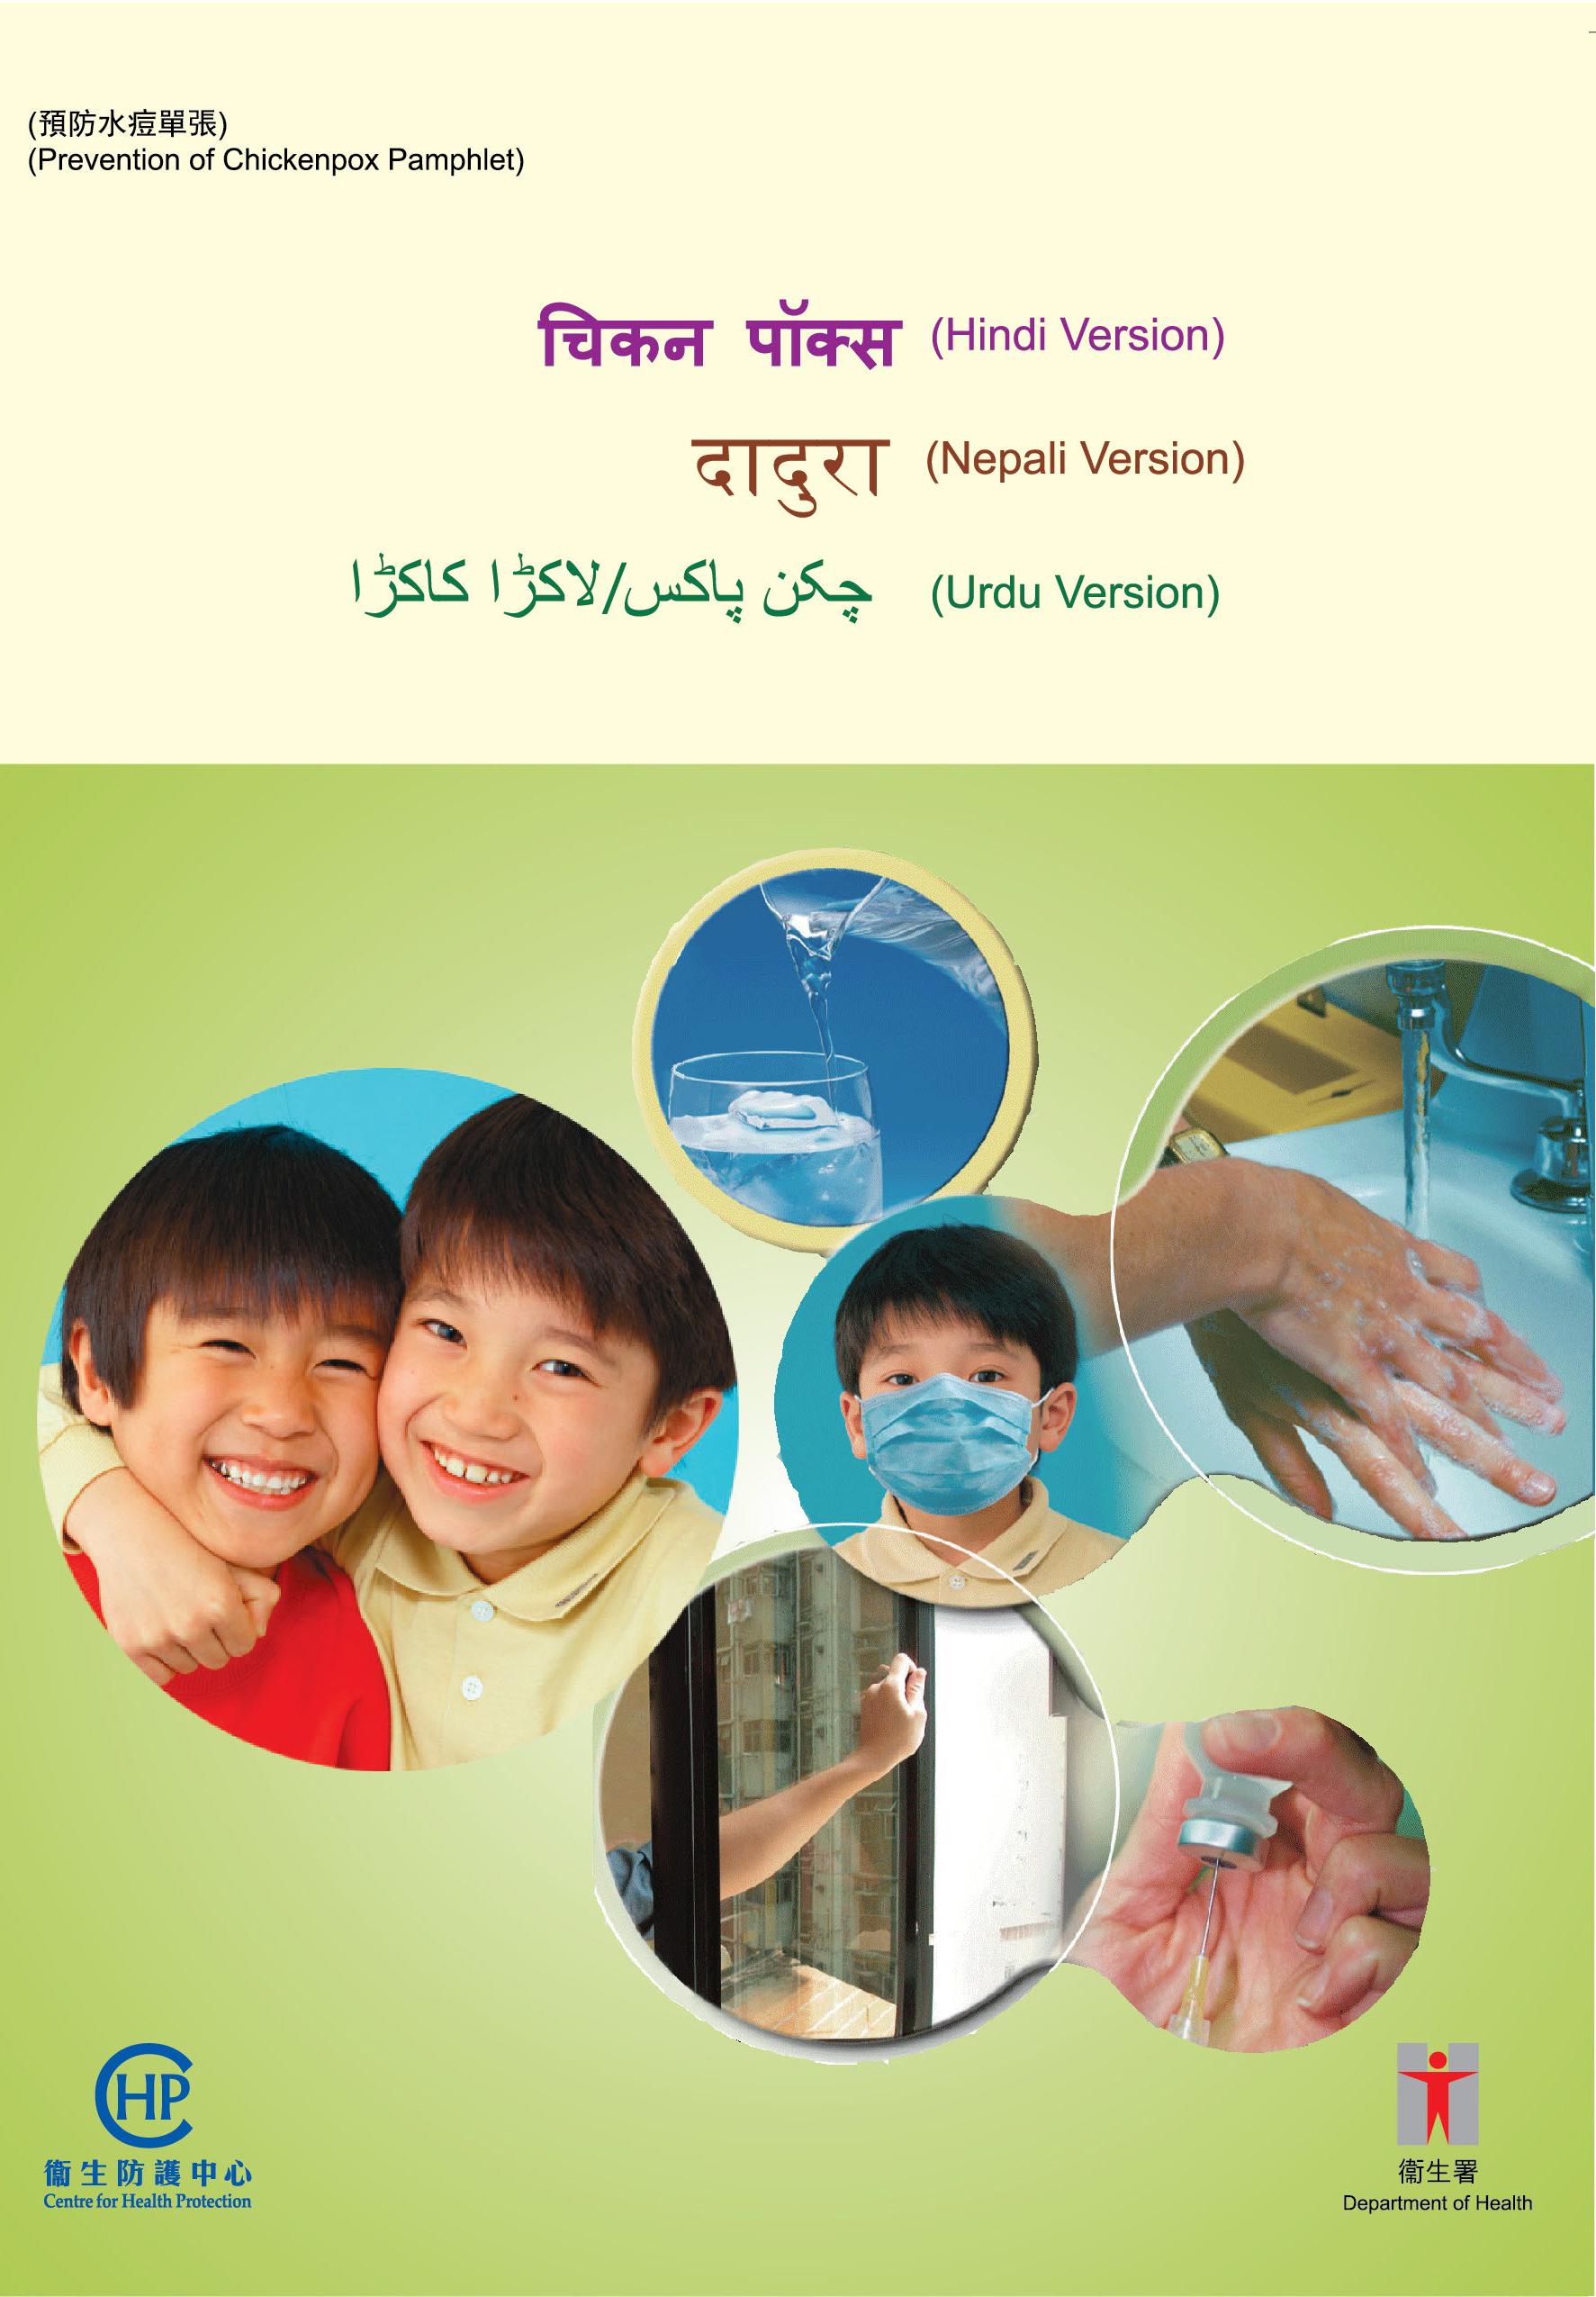 Centre for Health Protection - Chickenpox - Nepali Version